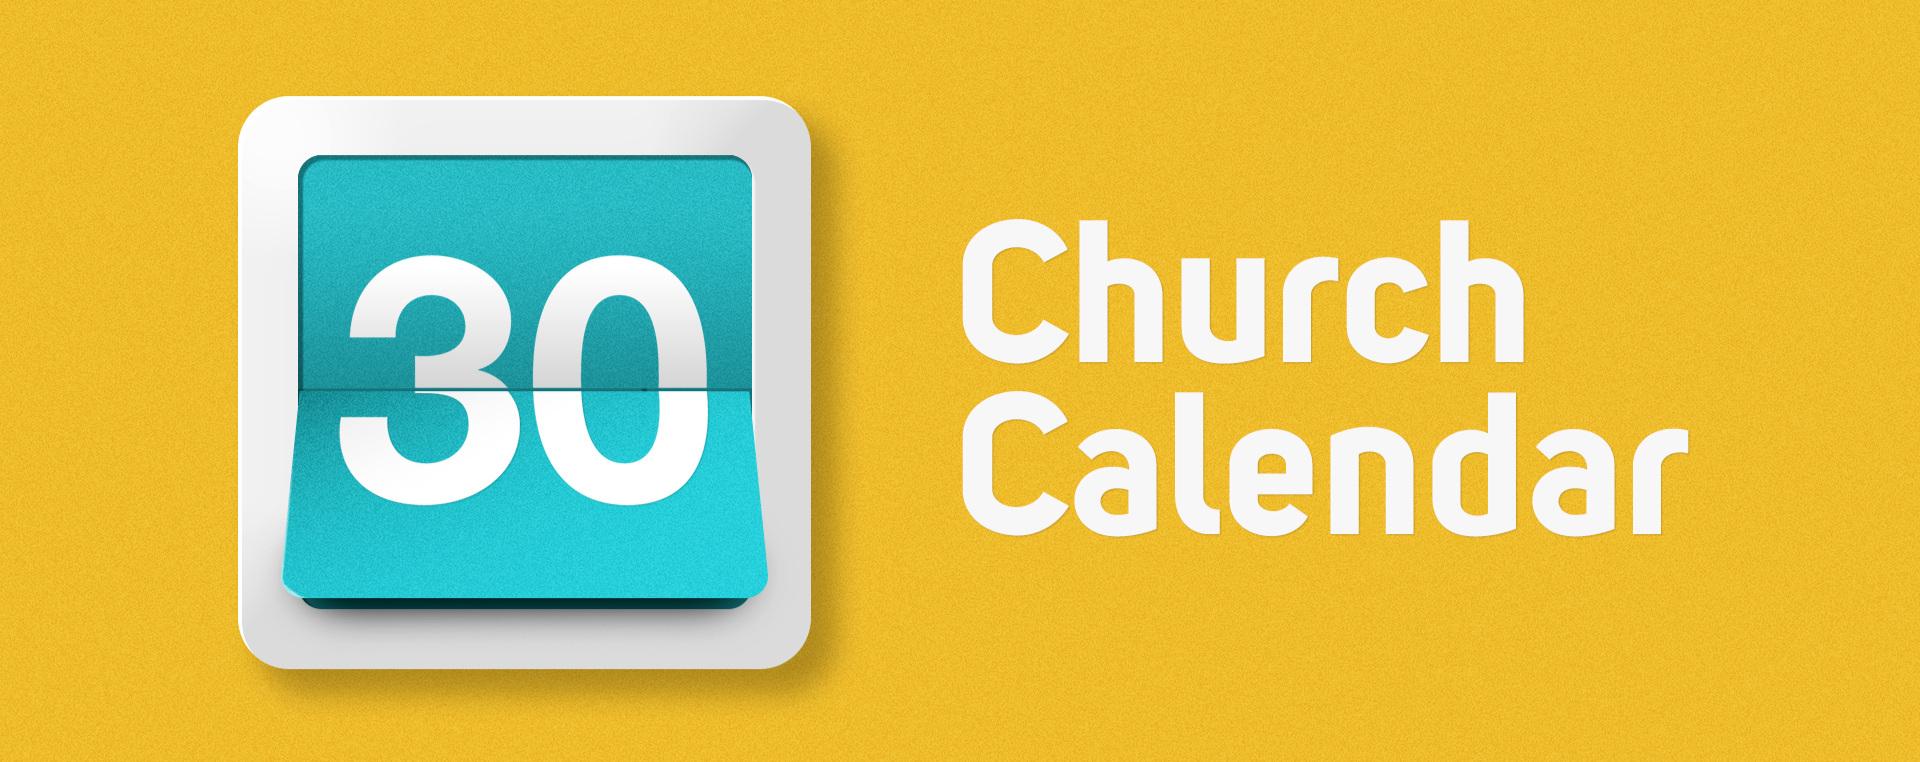 Church+Calendar+Image.jpg